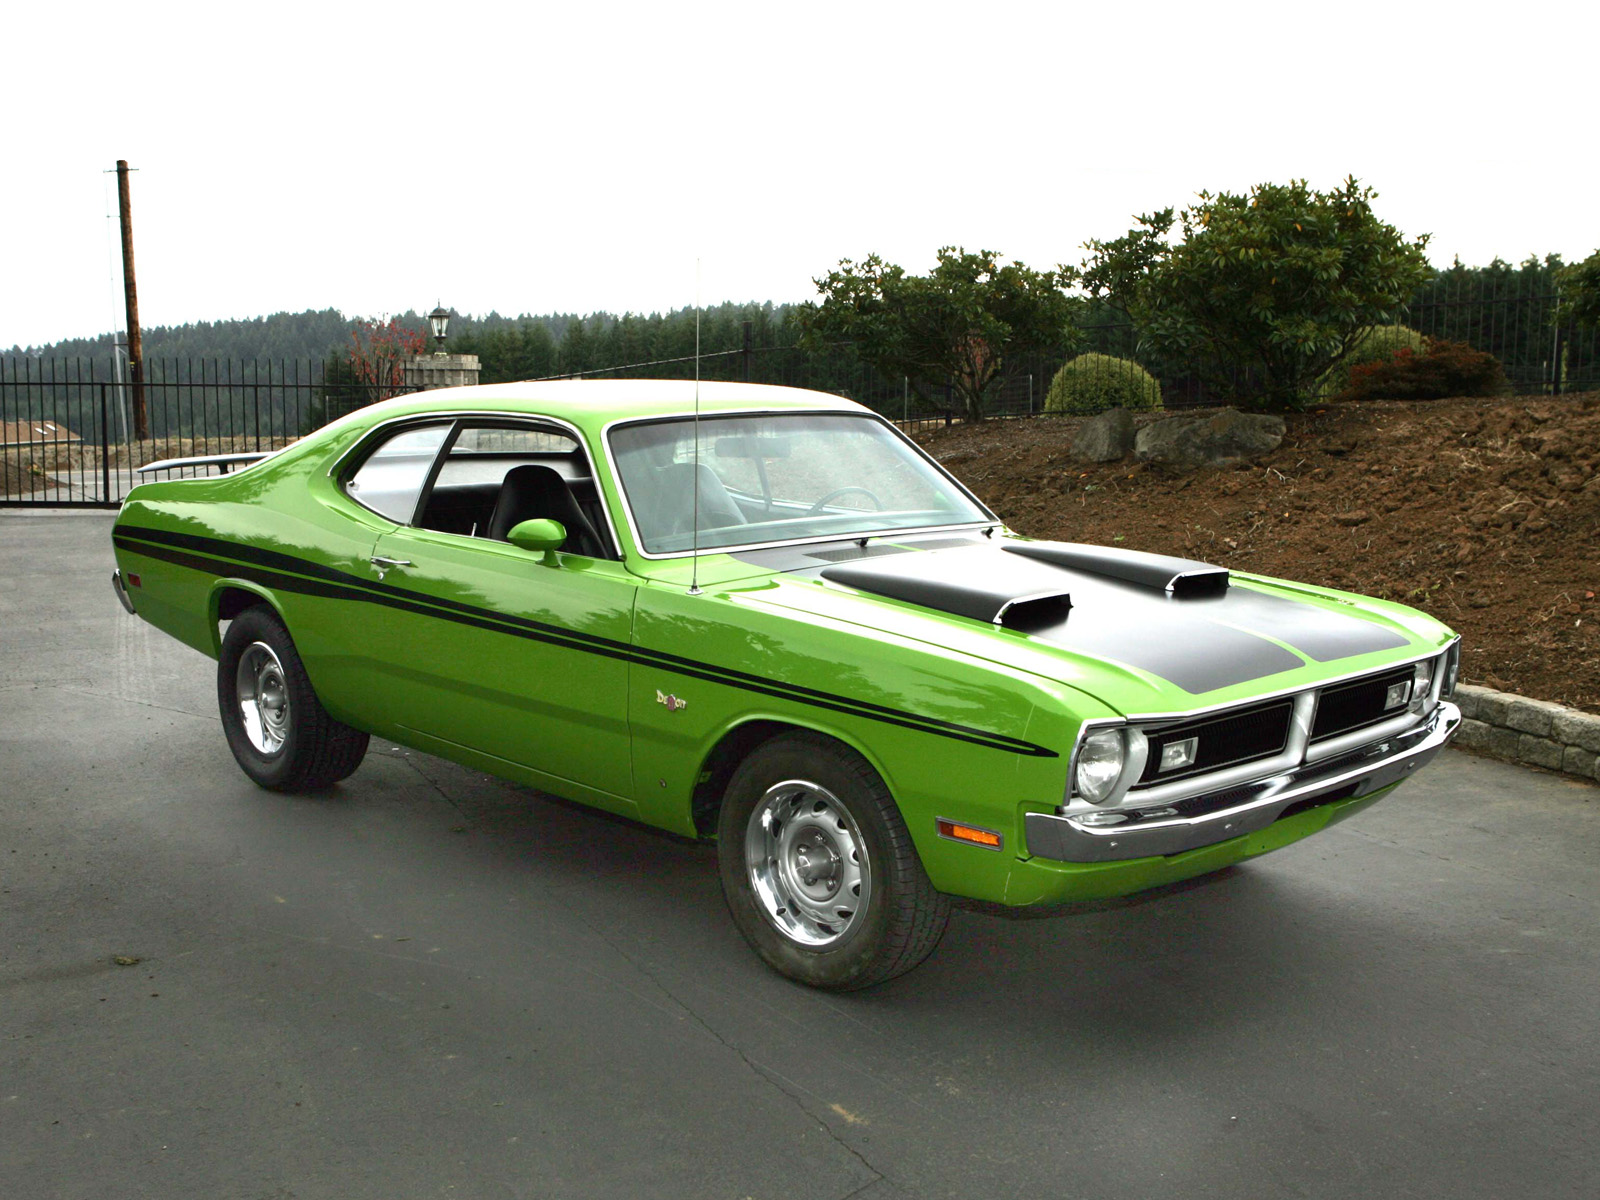 1971 dodge demon muscle cars hot rod wallpaper 1600x1200. Black Bedroom Furniture Sets. Home Design Ideas